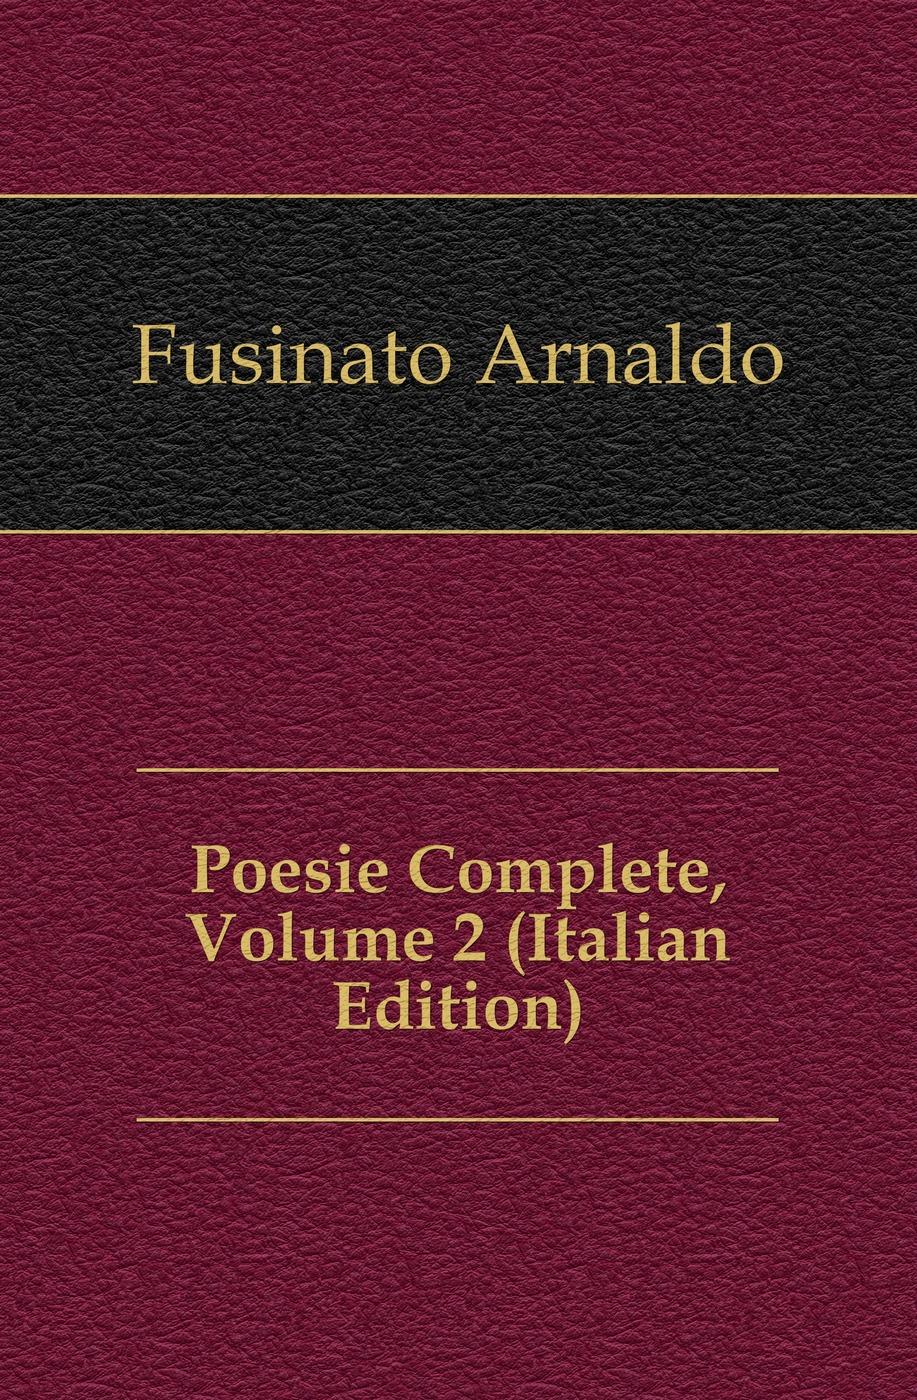 Fusinato Arnaldo Poesie Complete, Volume 2 (Italian Edition) fuà fusinato erminia versi italian edition